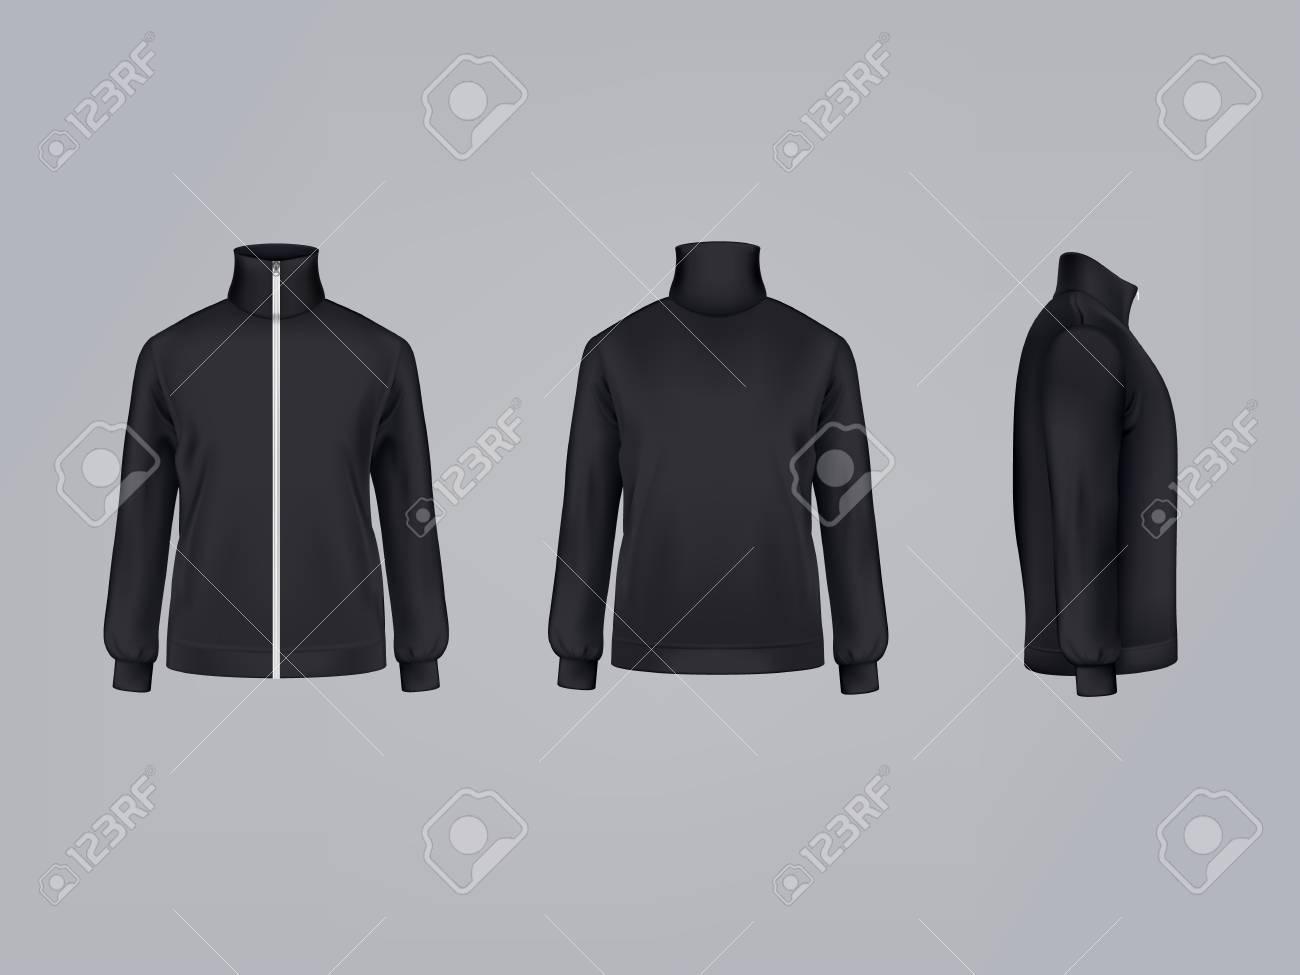 Sport jacket or long sleeve black sweatshirt vector illustration 3D mockup model template front, side and back view. - 95088597